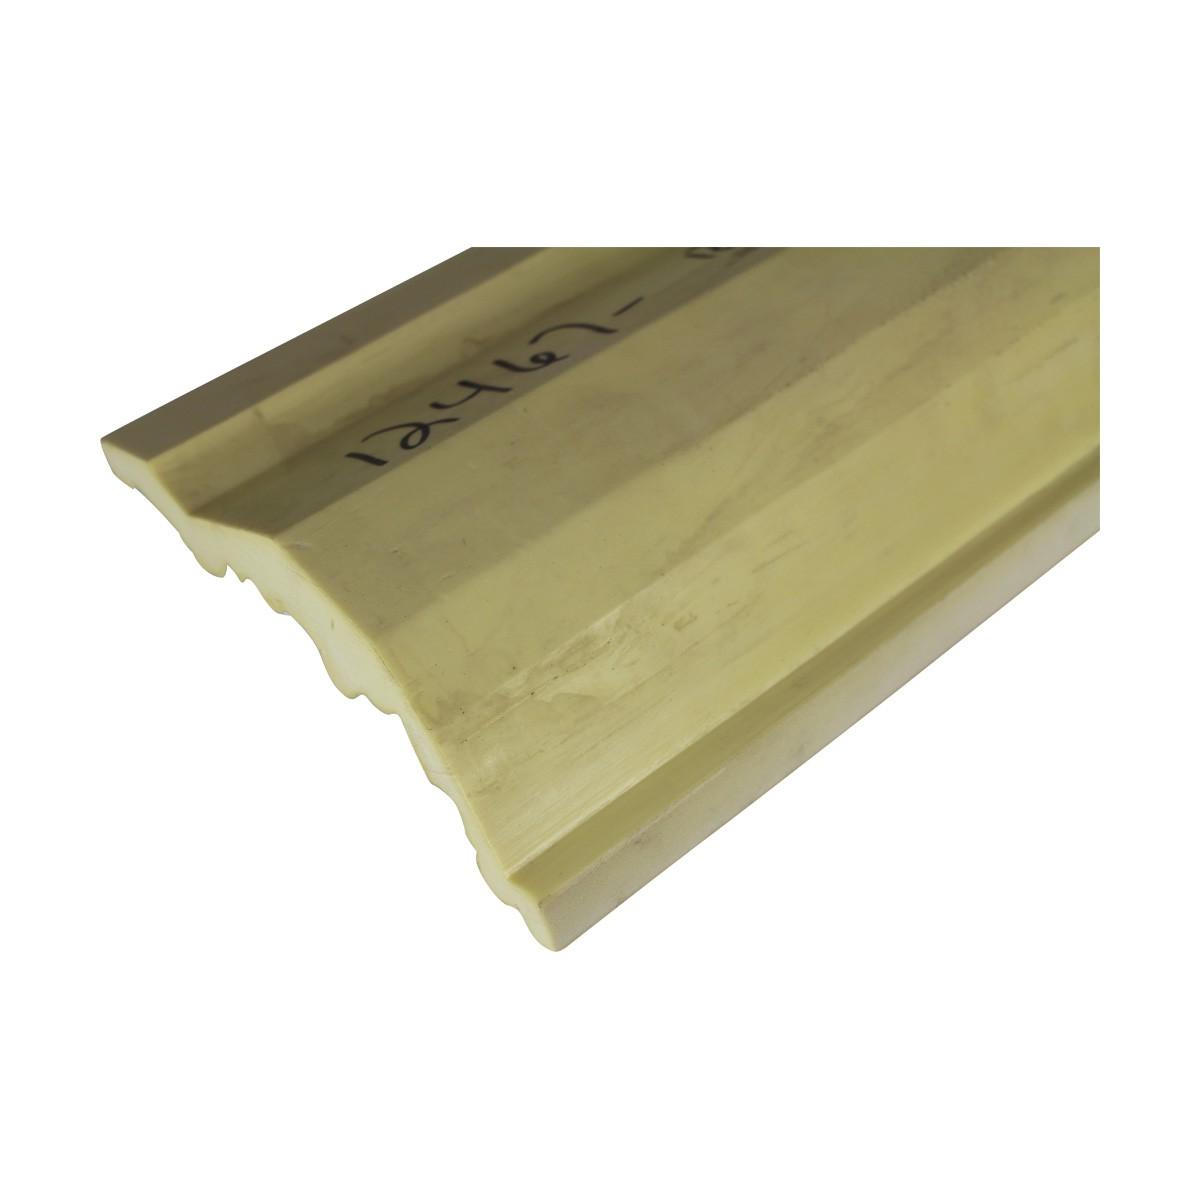 Cornice White Urethane Sample of 10503 23.25 Long Cornice Cornice Moulding Cornice Molding